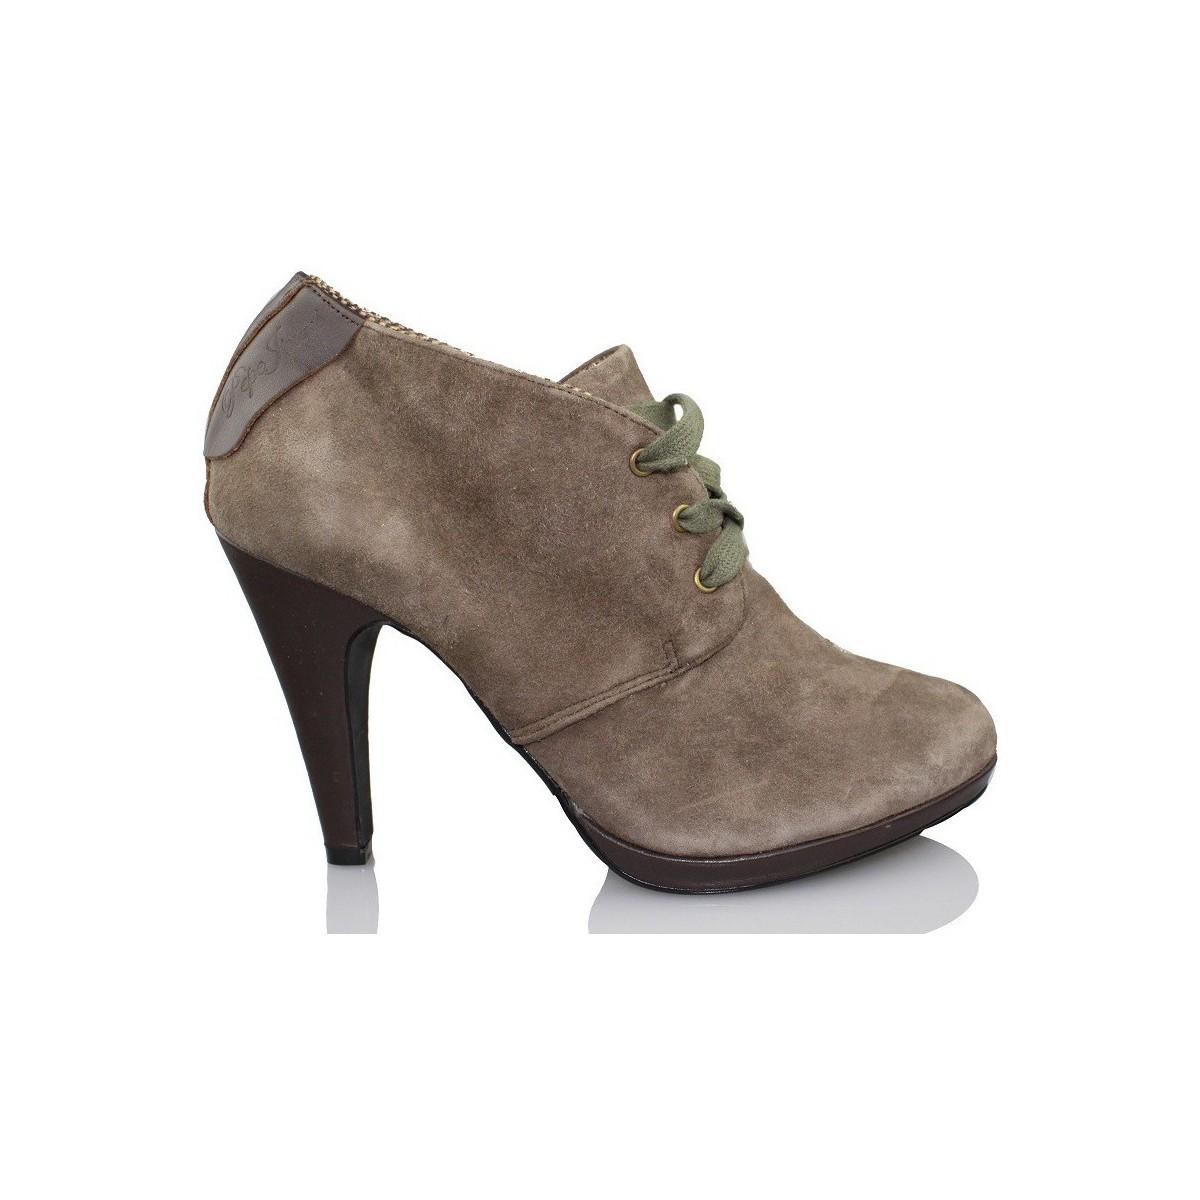 Pepe jeans Beute elegante Frau BRAUN - Schuhe Ankle Boots Damen 110,25 €